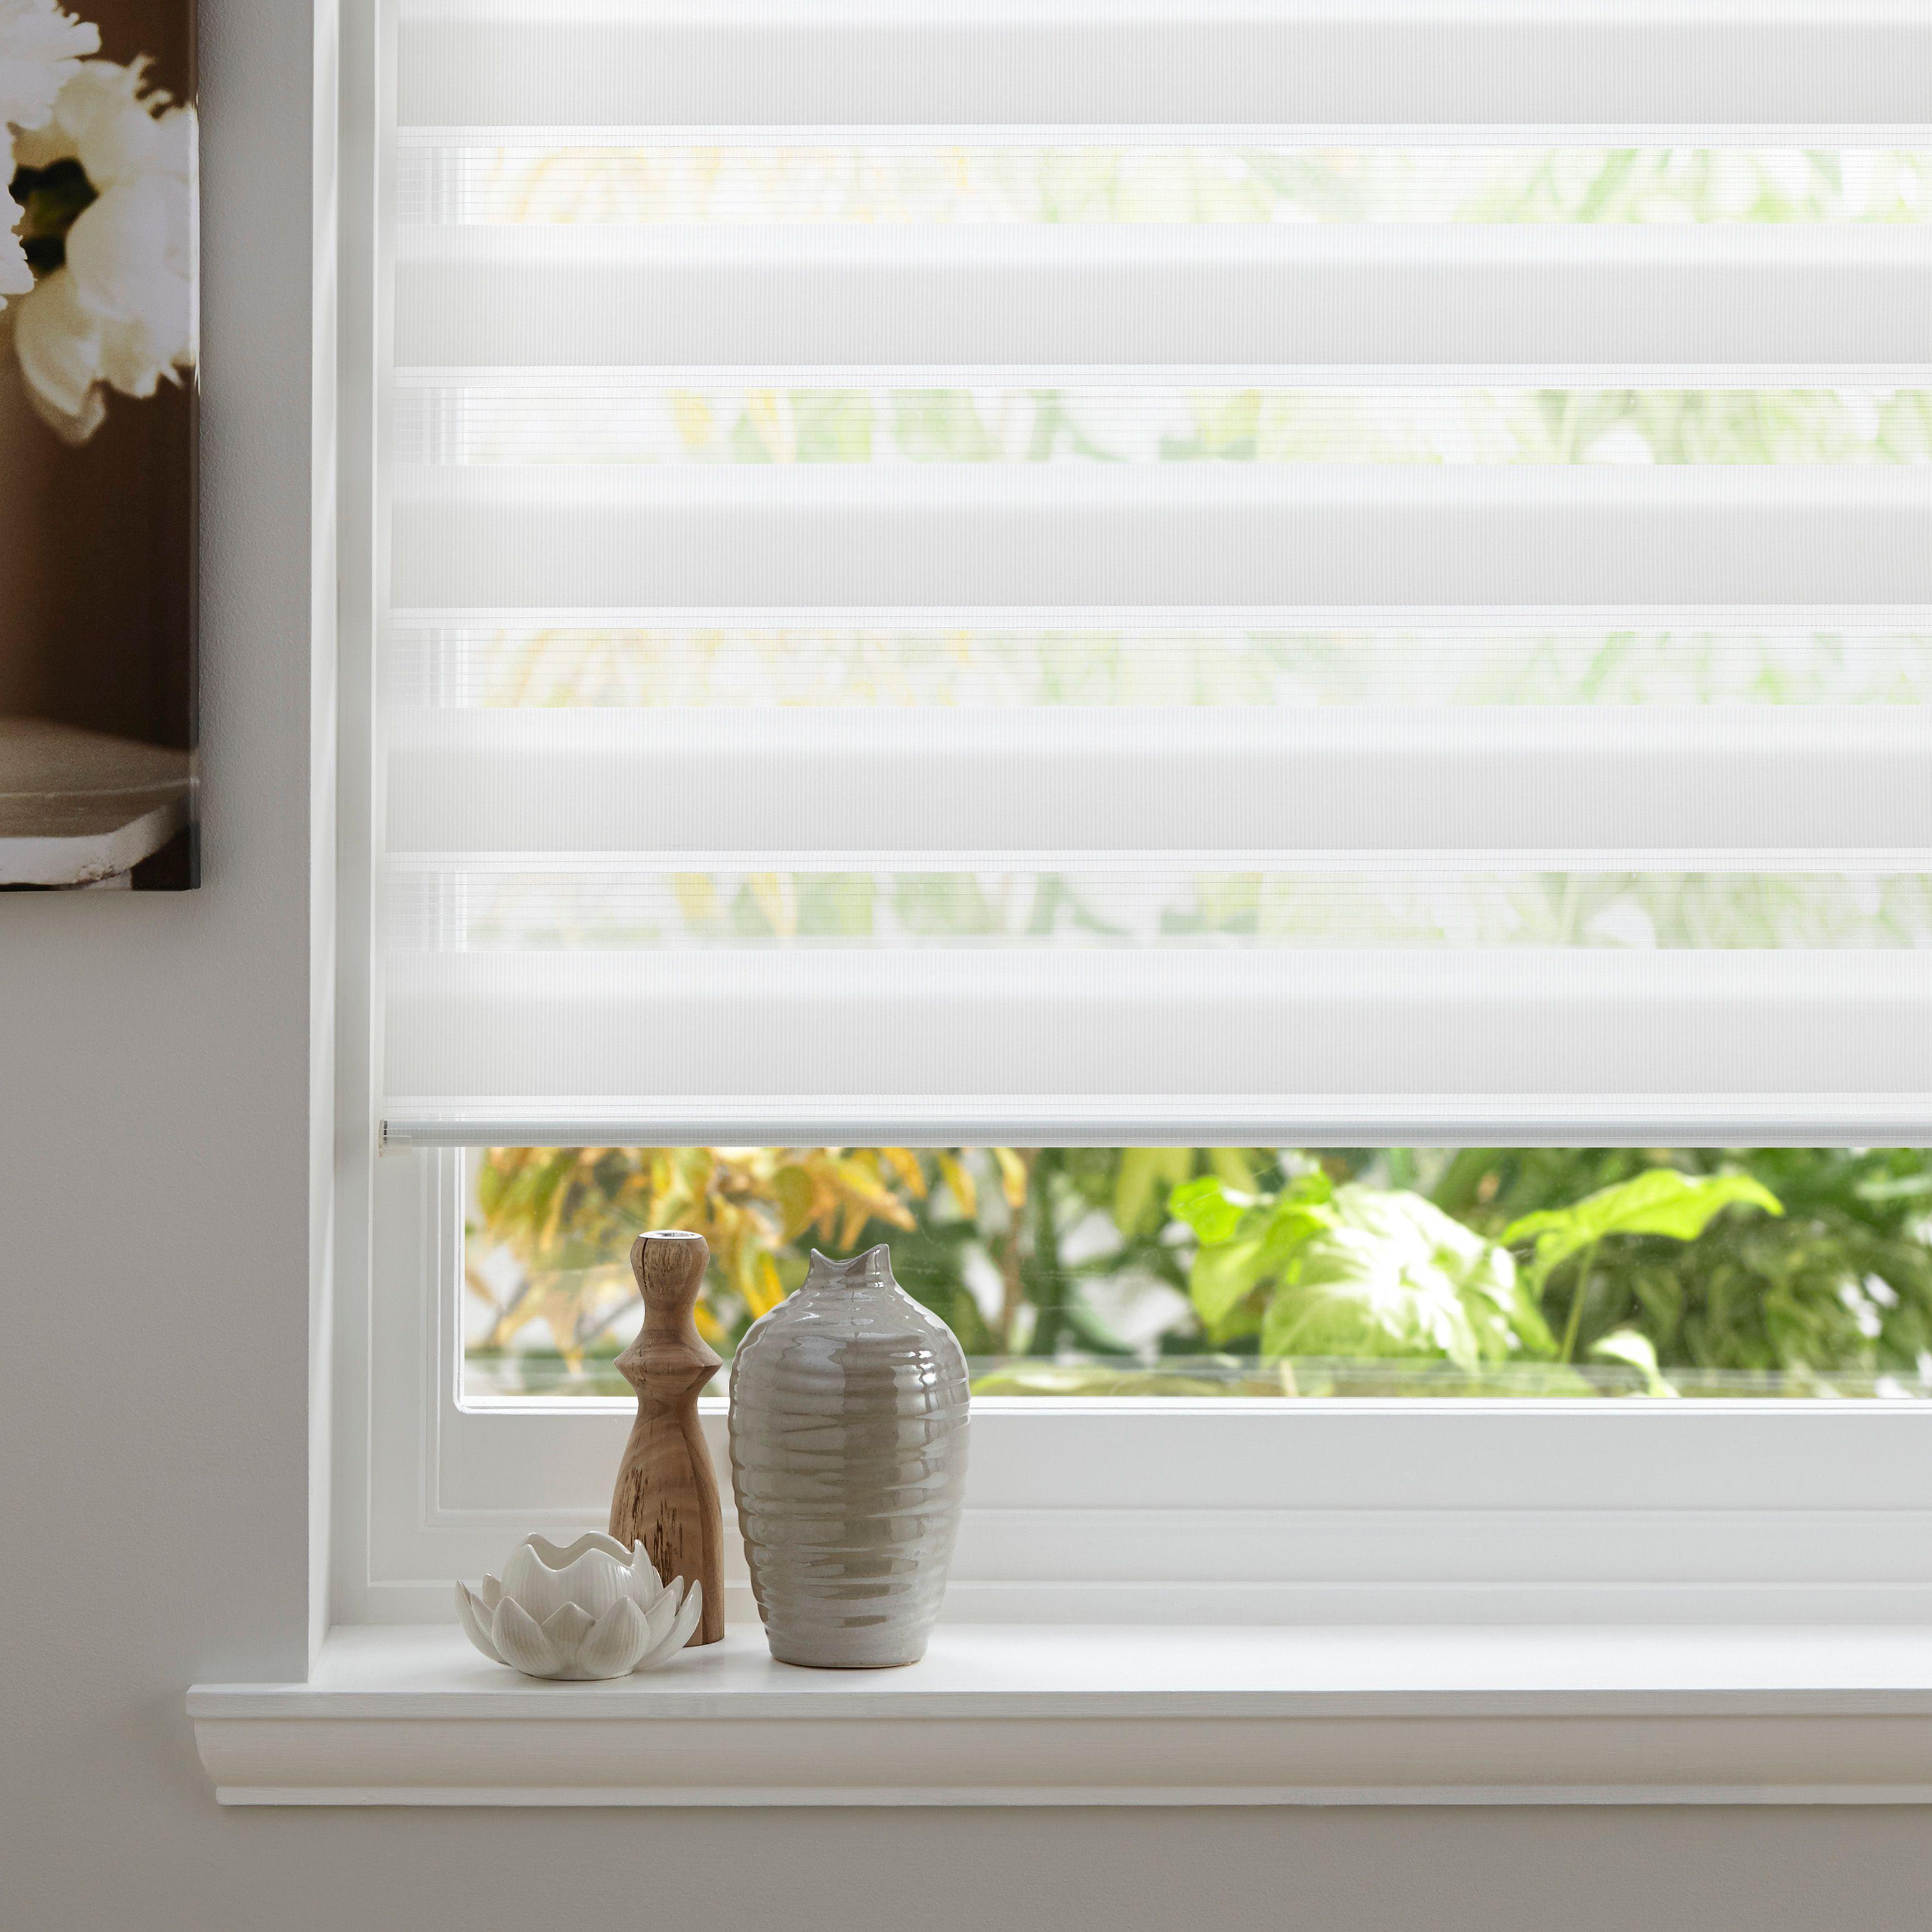 Bathroom Window Blinds B&Q colours day & night corded white roller blind (l)160 cm (w)90 cm